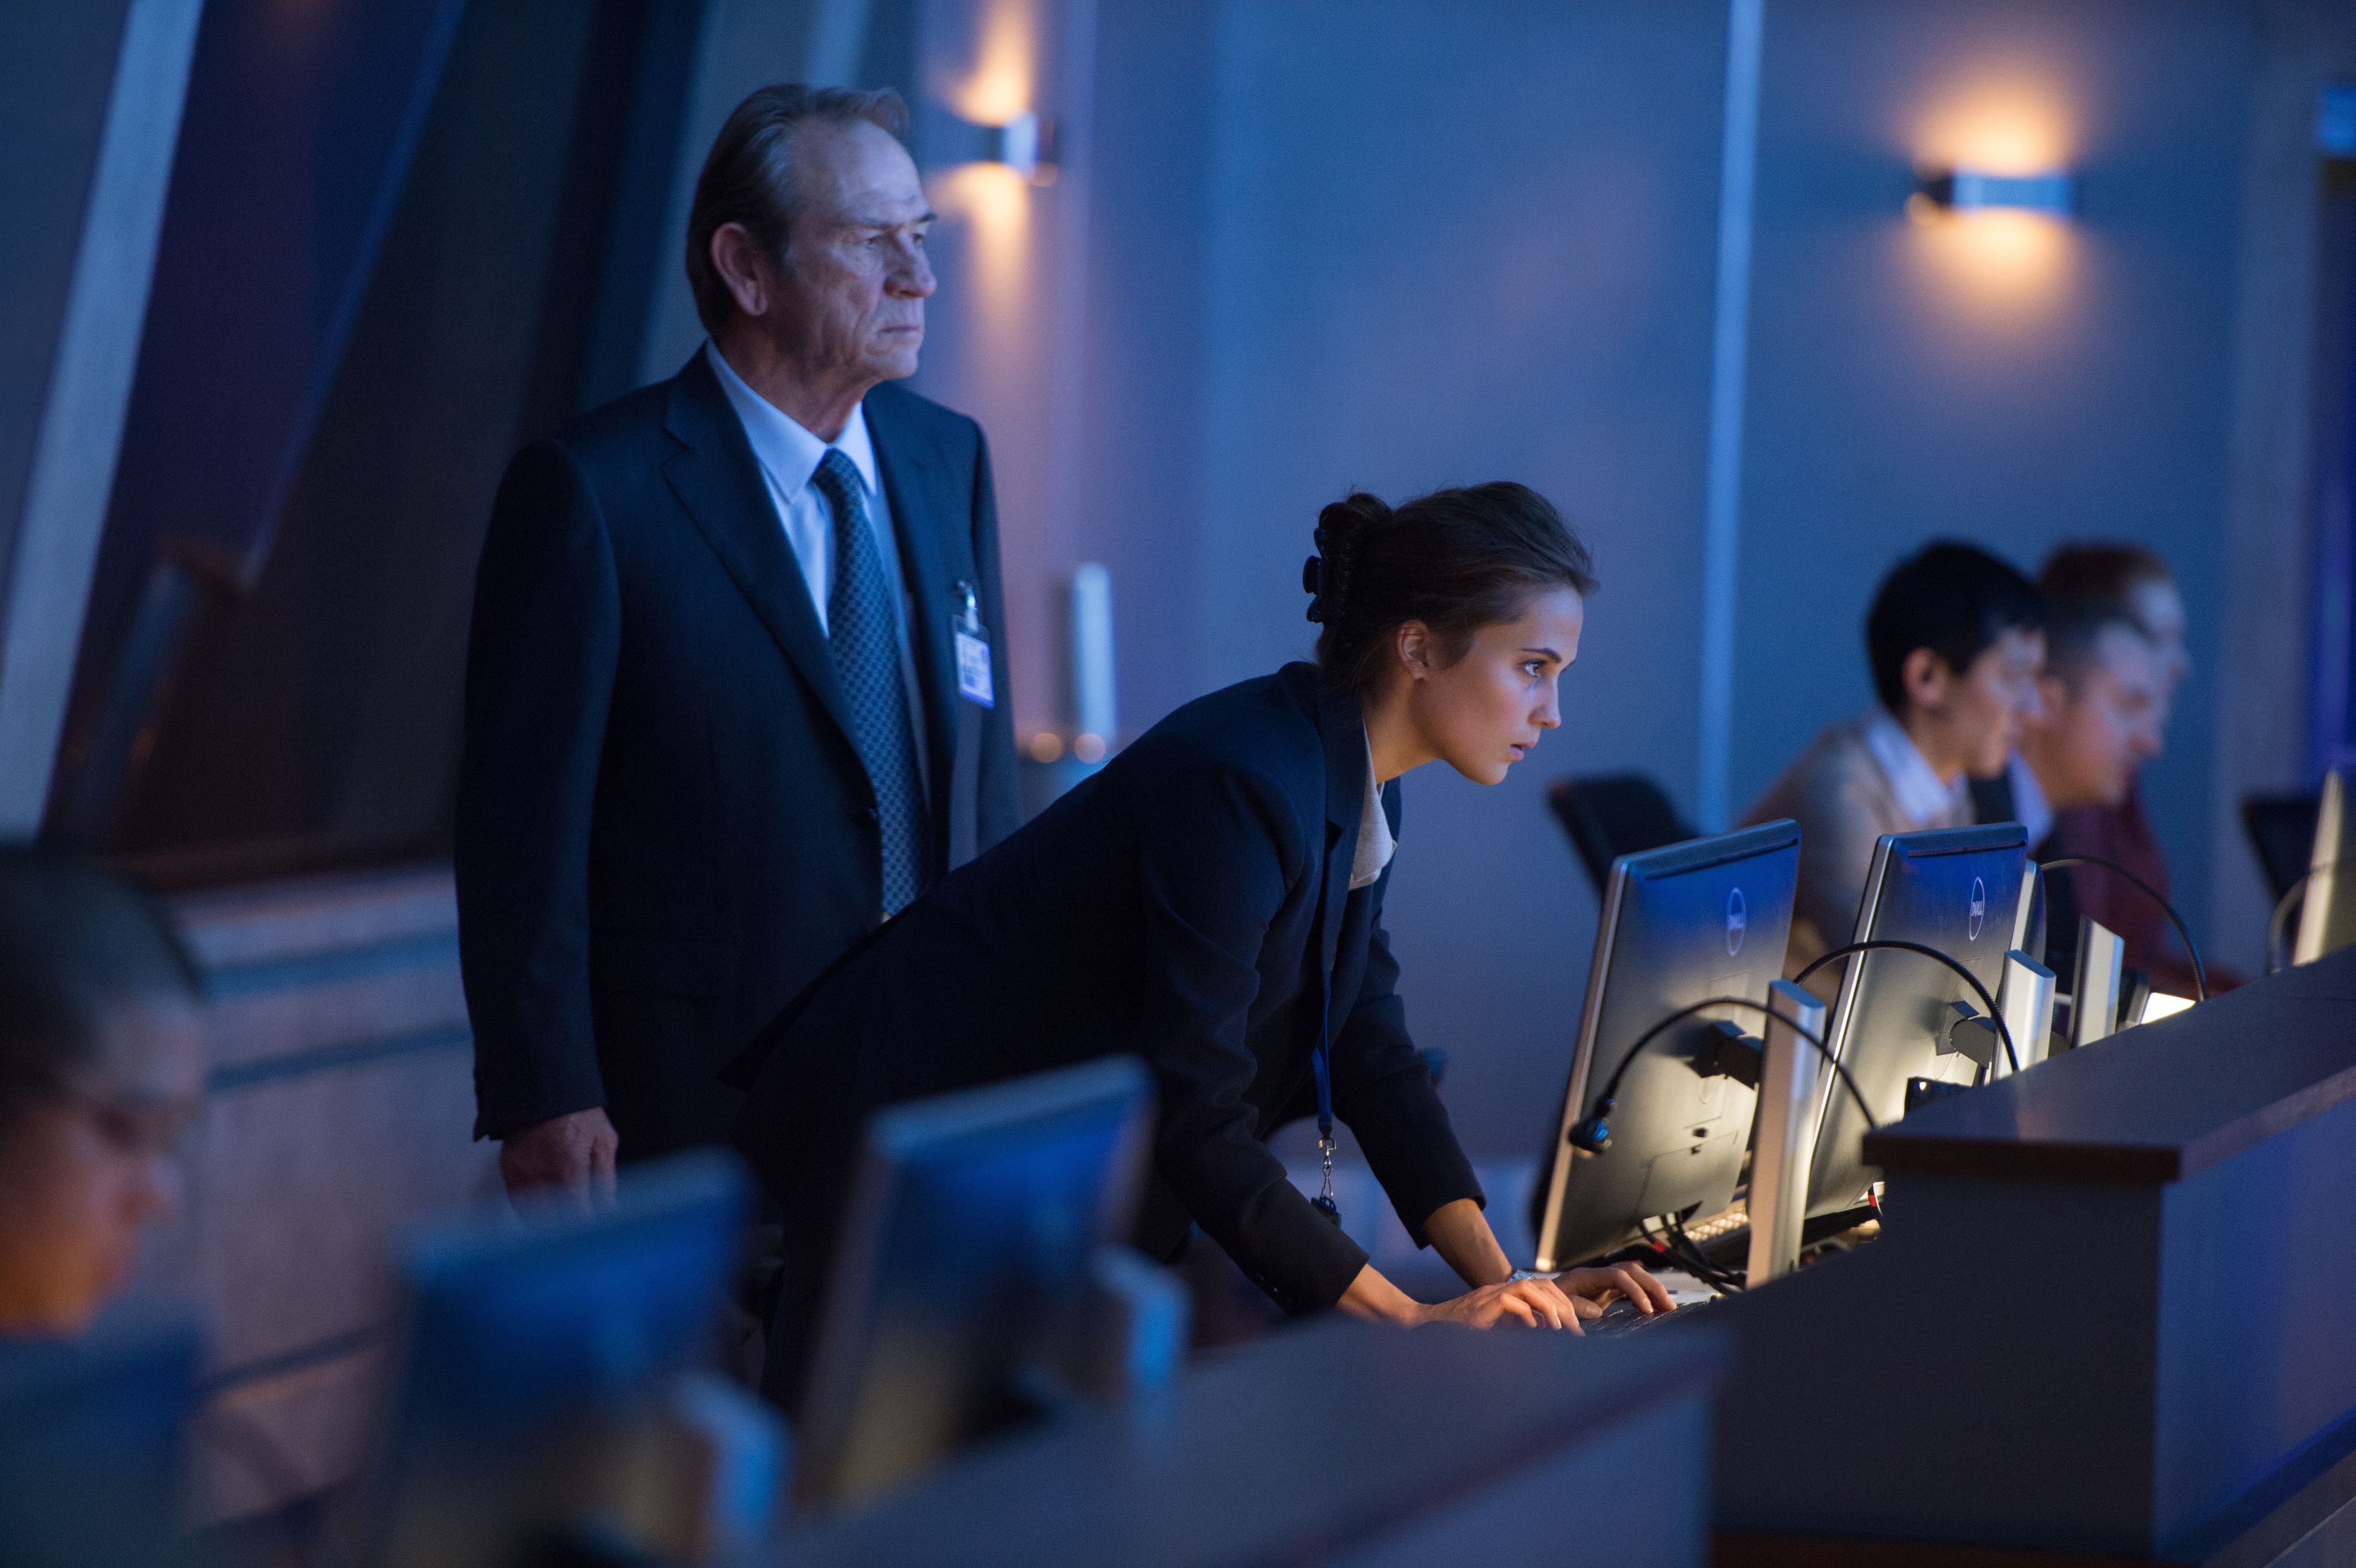 Matt Damon is back with a new 'Jason Bourne' featurette